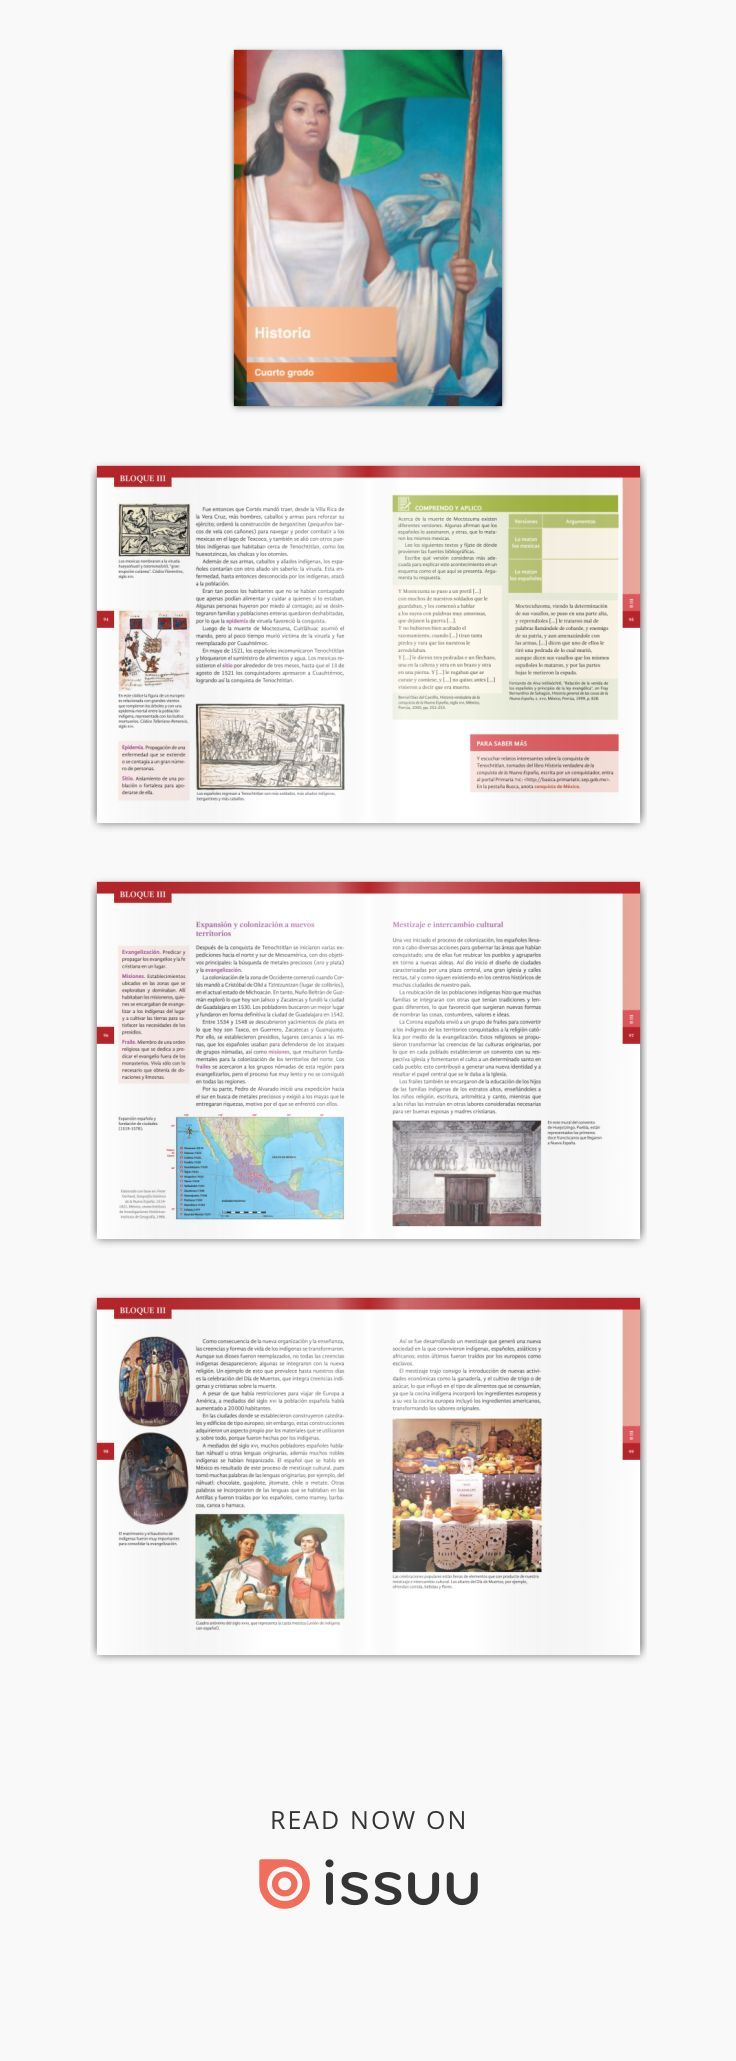 Primaria cuarto grado historia libro de texto | Historia | Pinterest